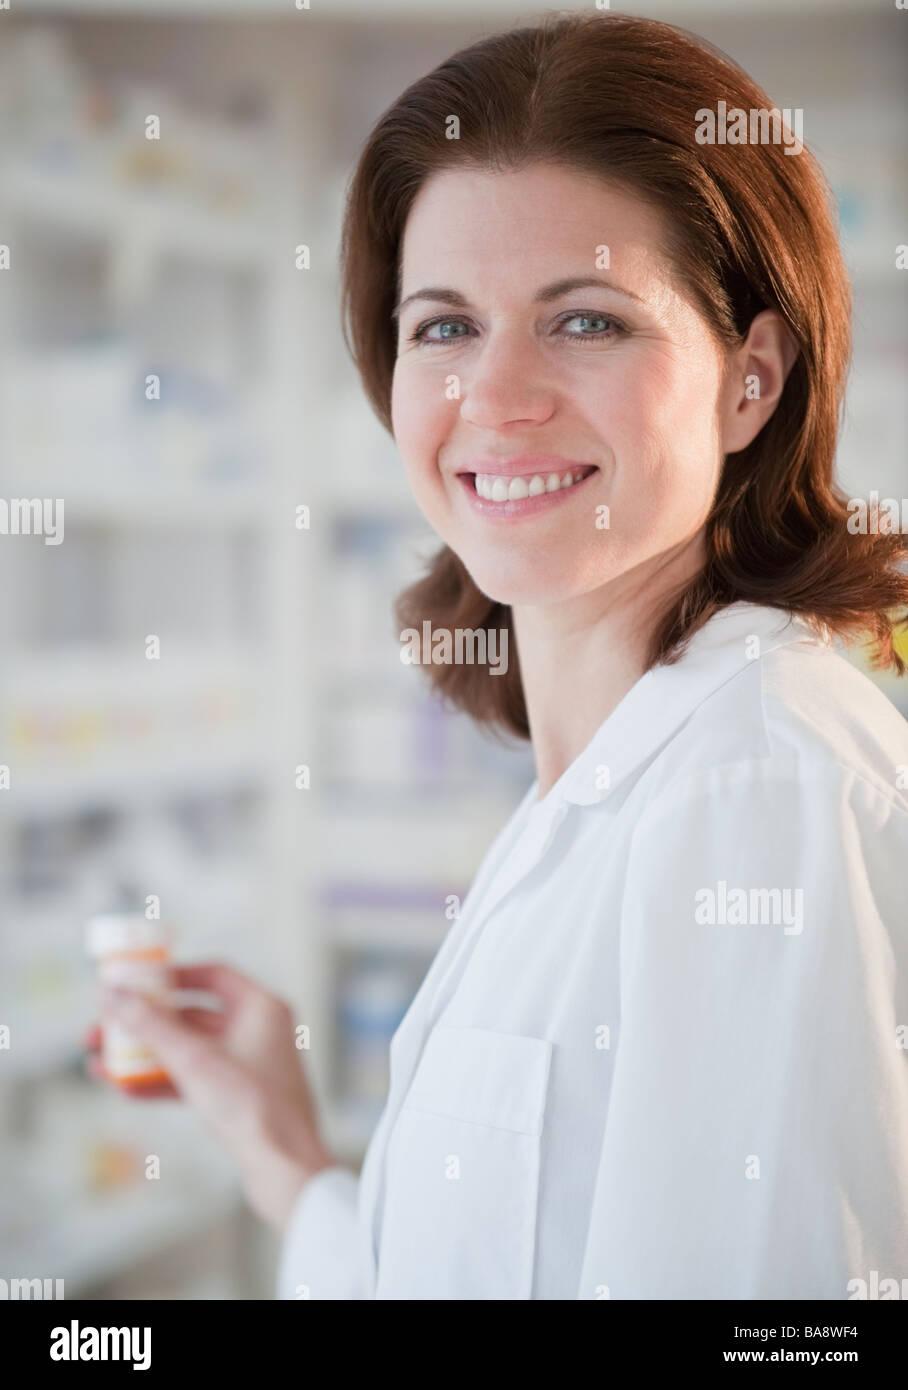 Pharmacist filling prescription - Stock Image